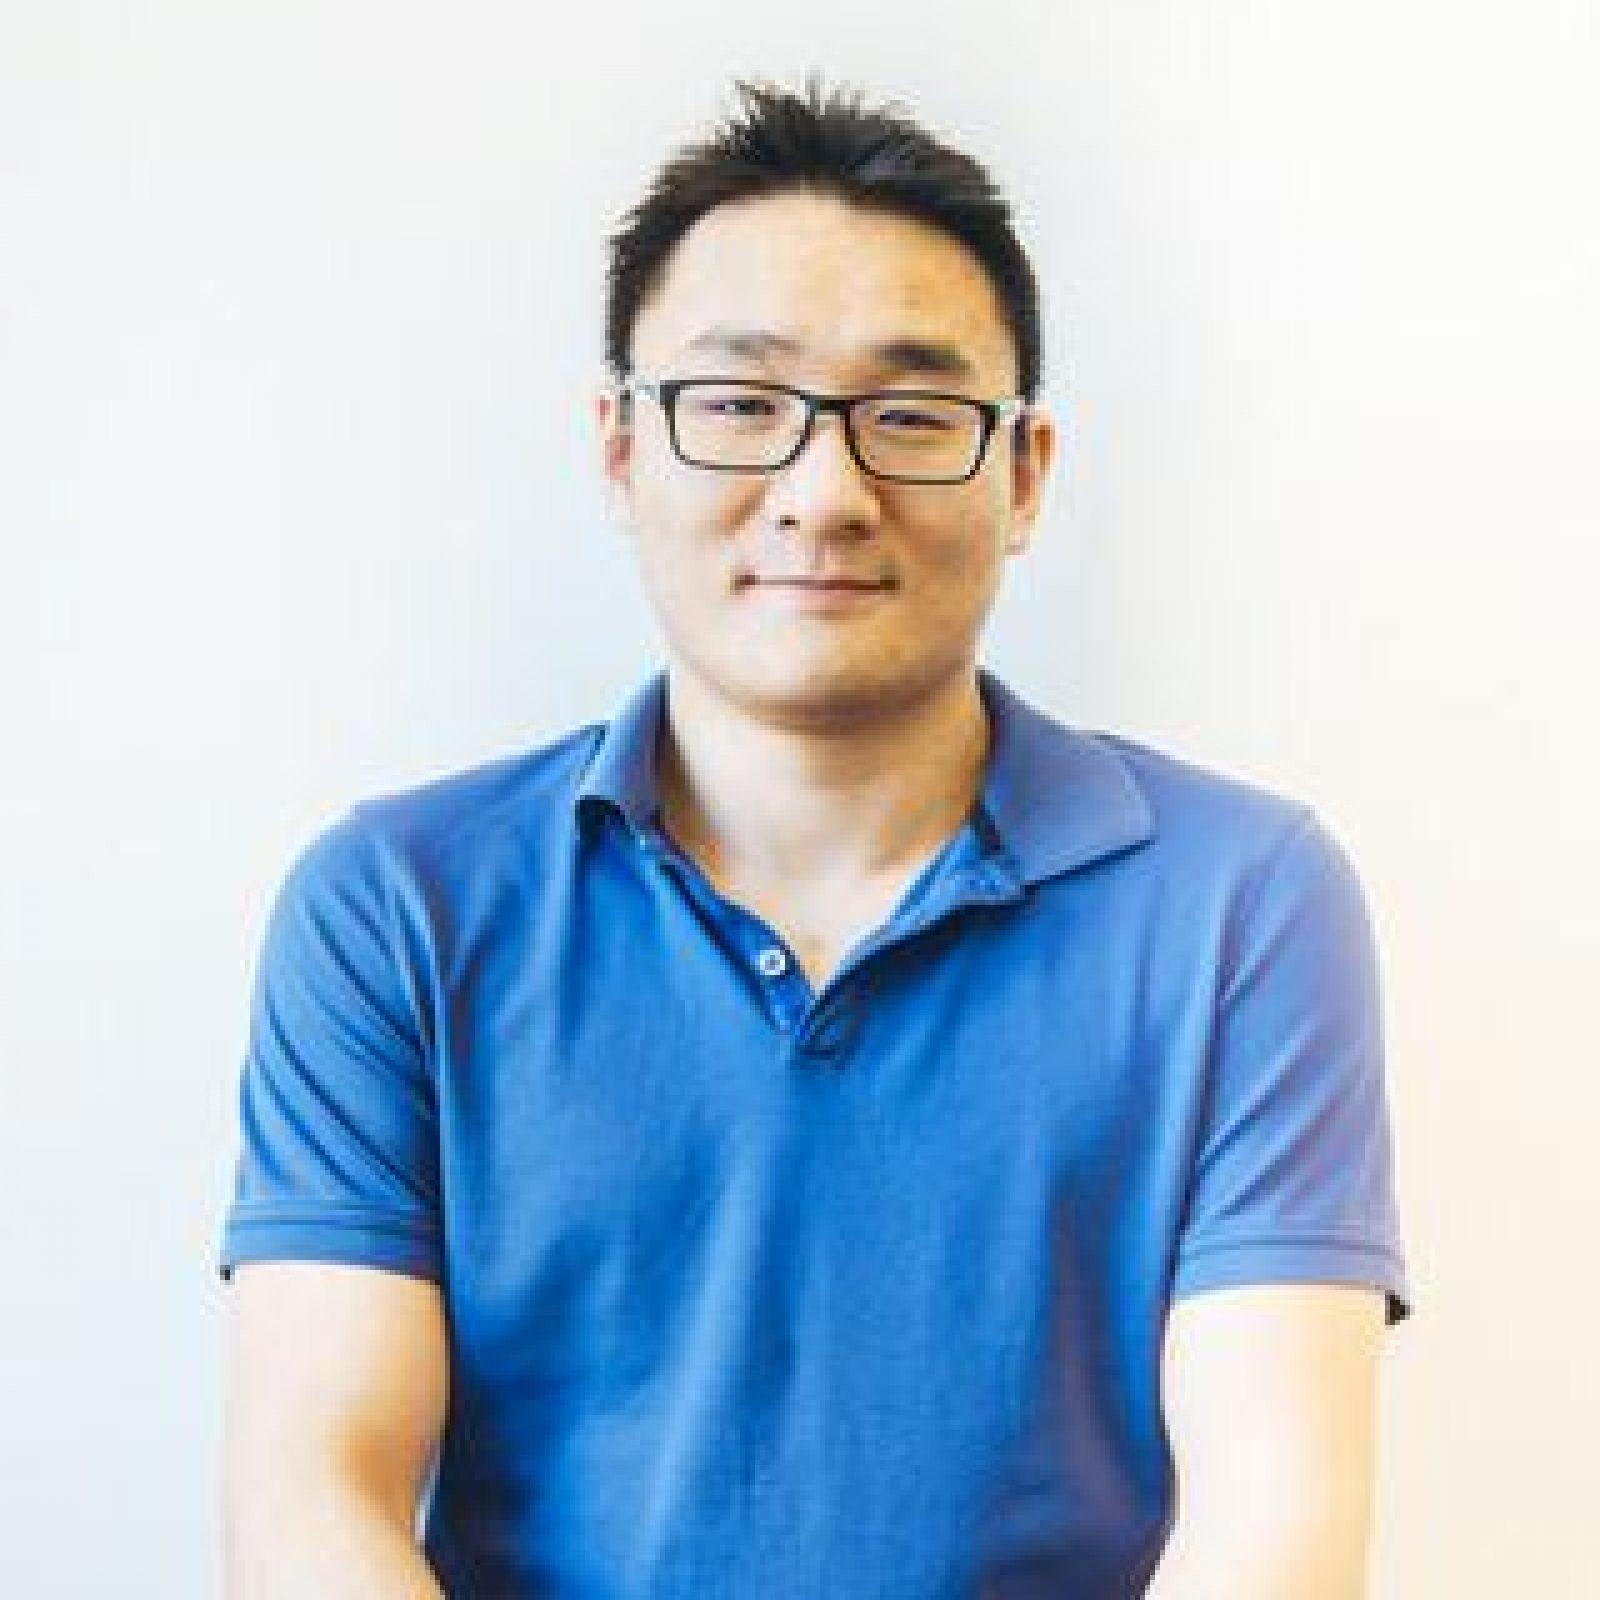 Yang Han photo